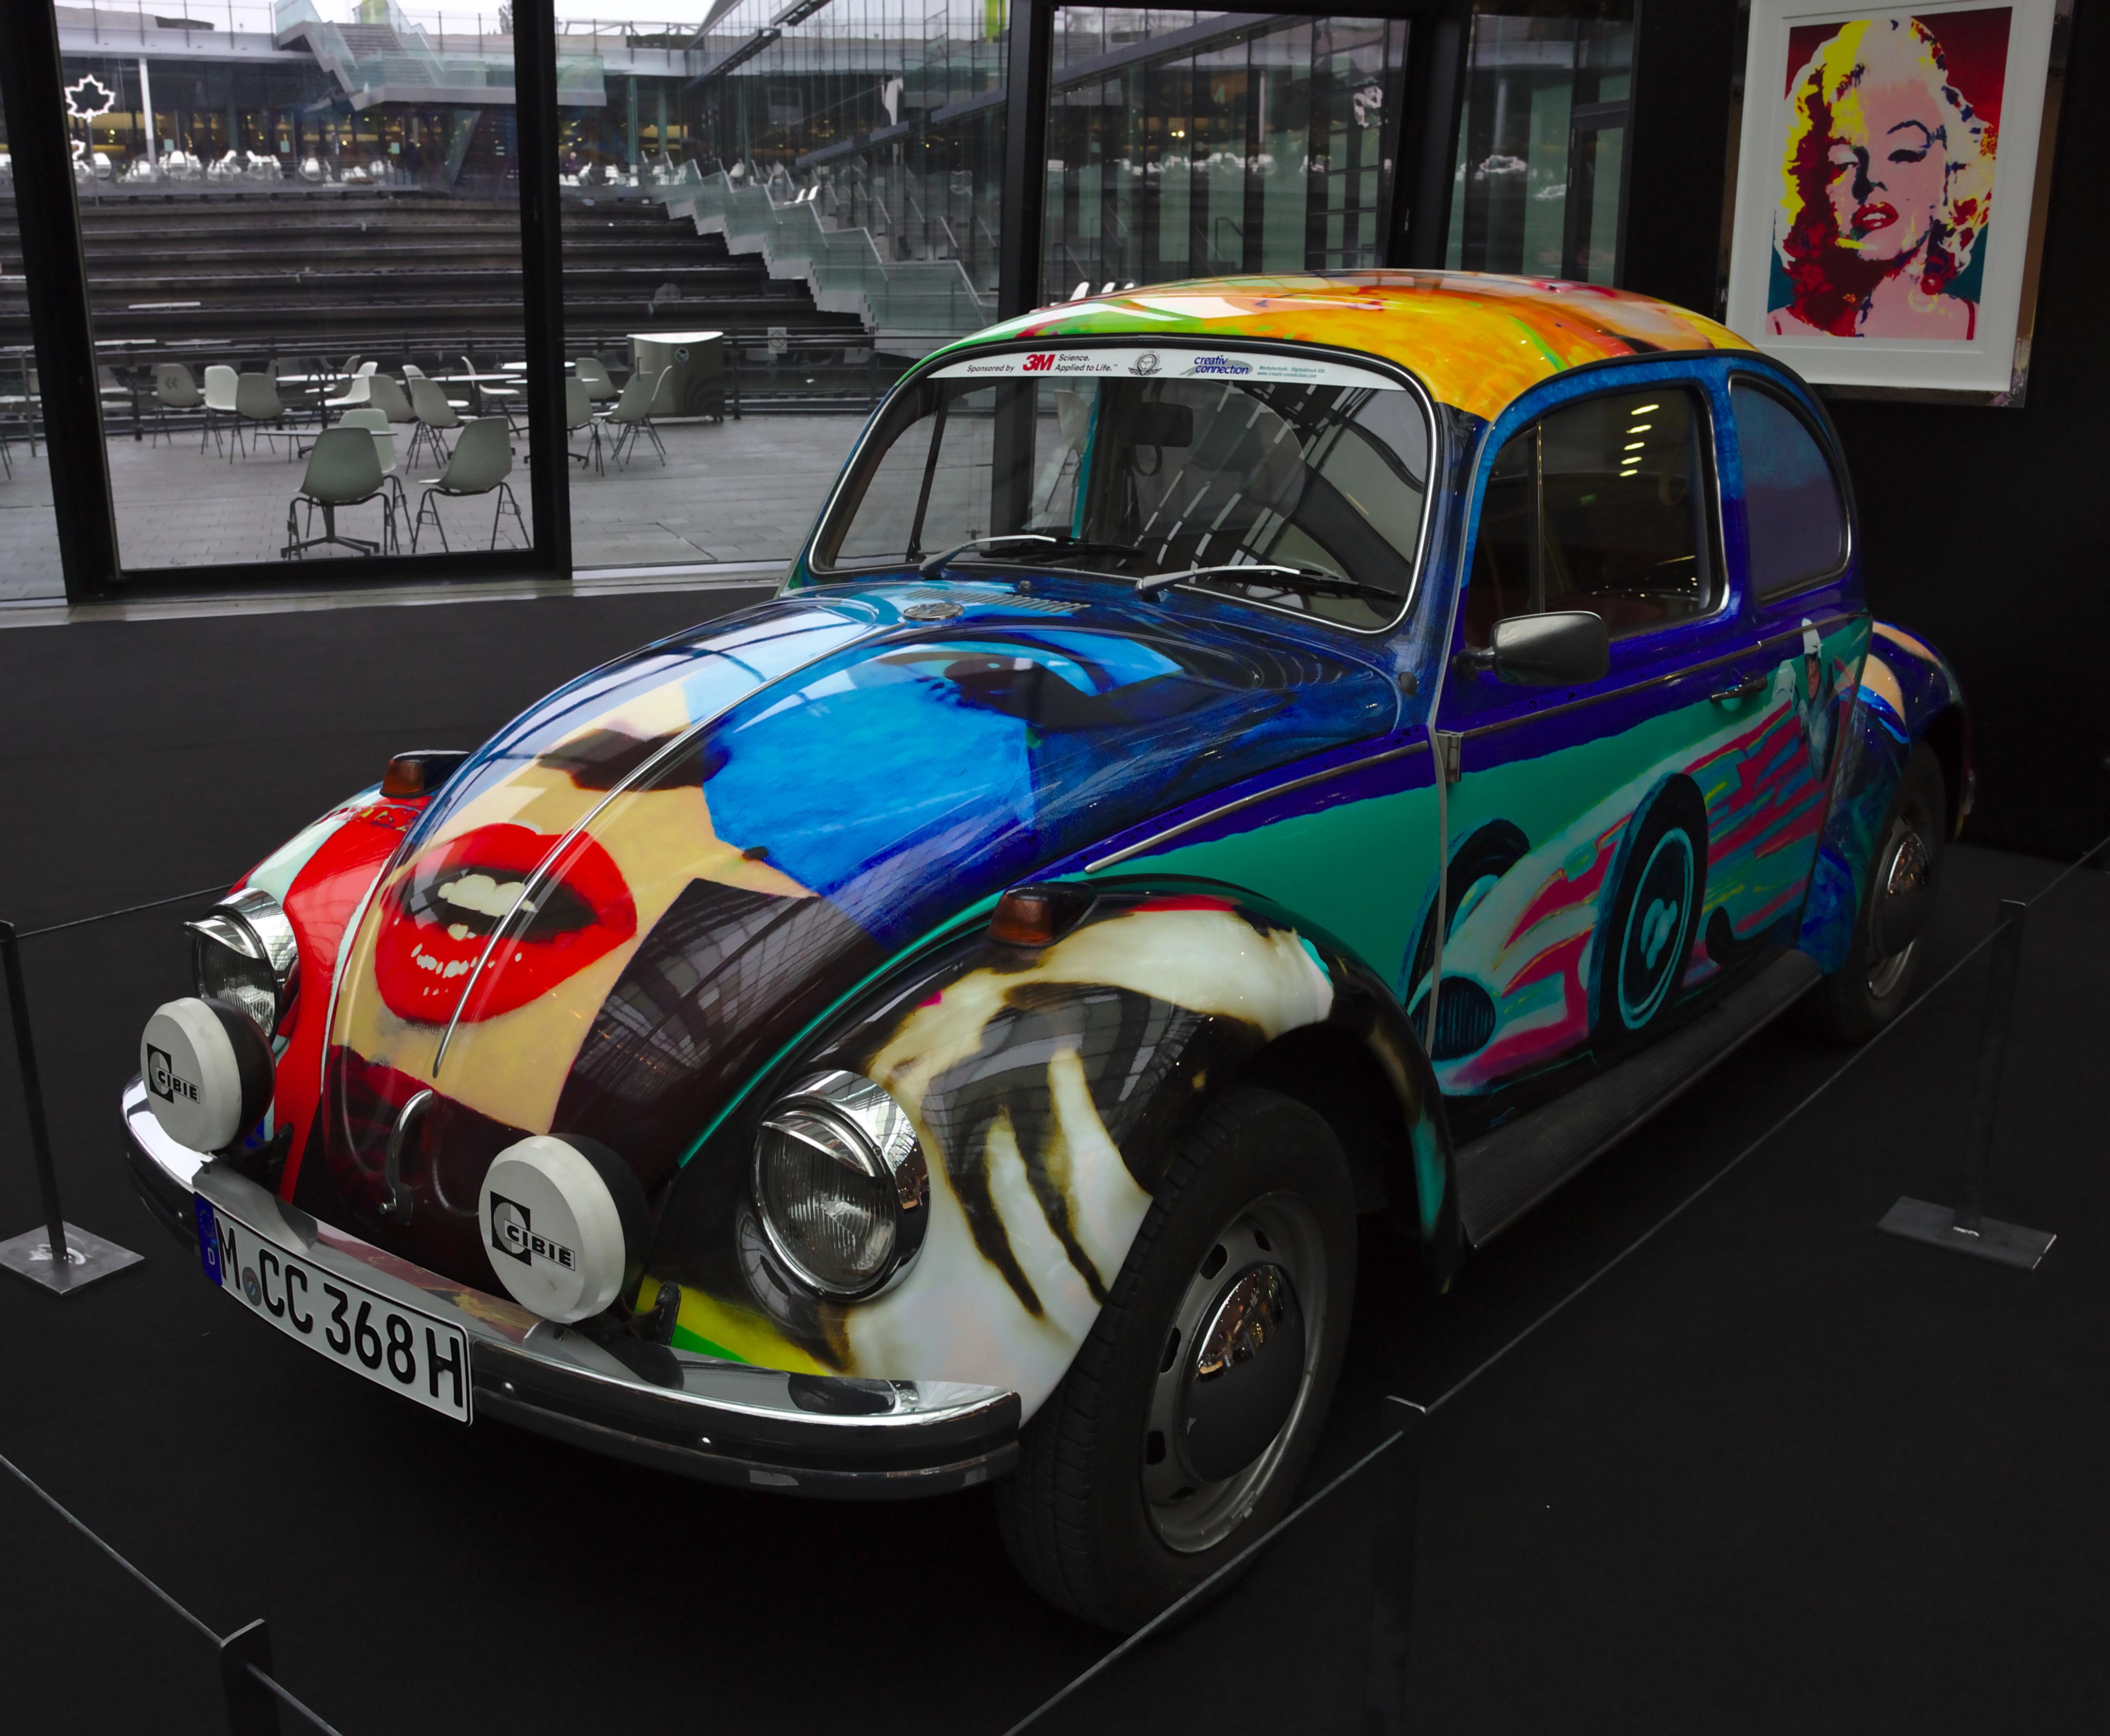 VW_K%C3%A4fer_1X7A8186.jpg